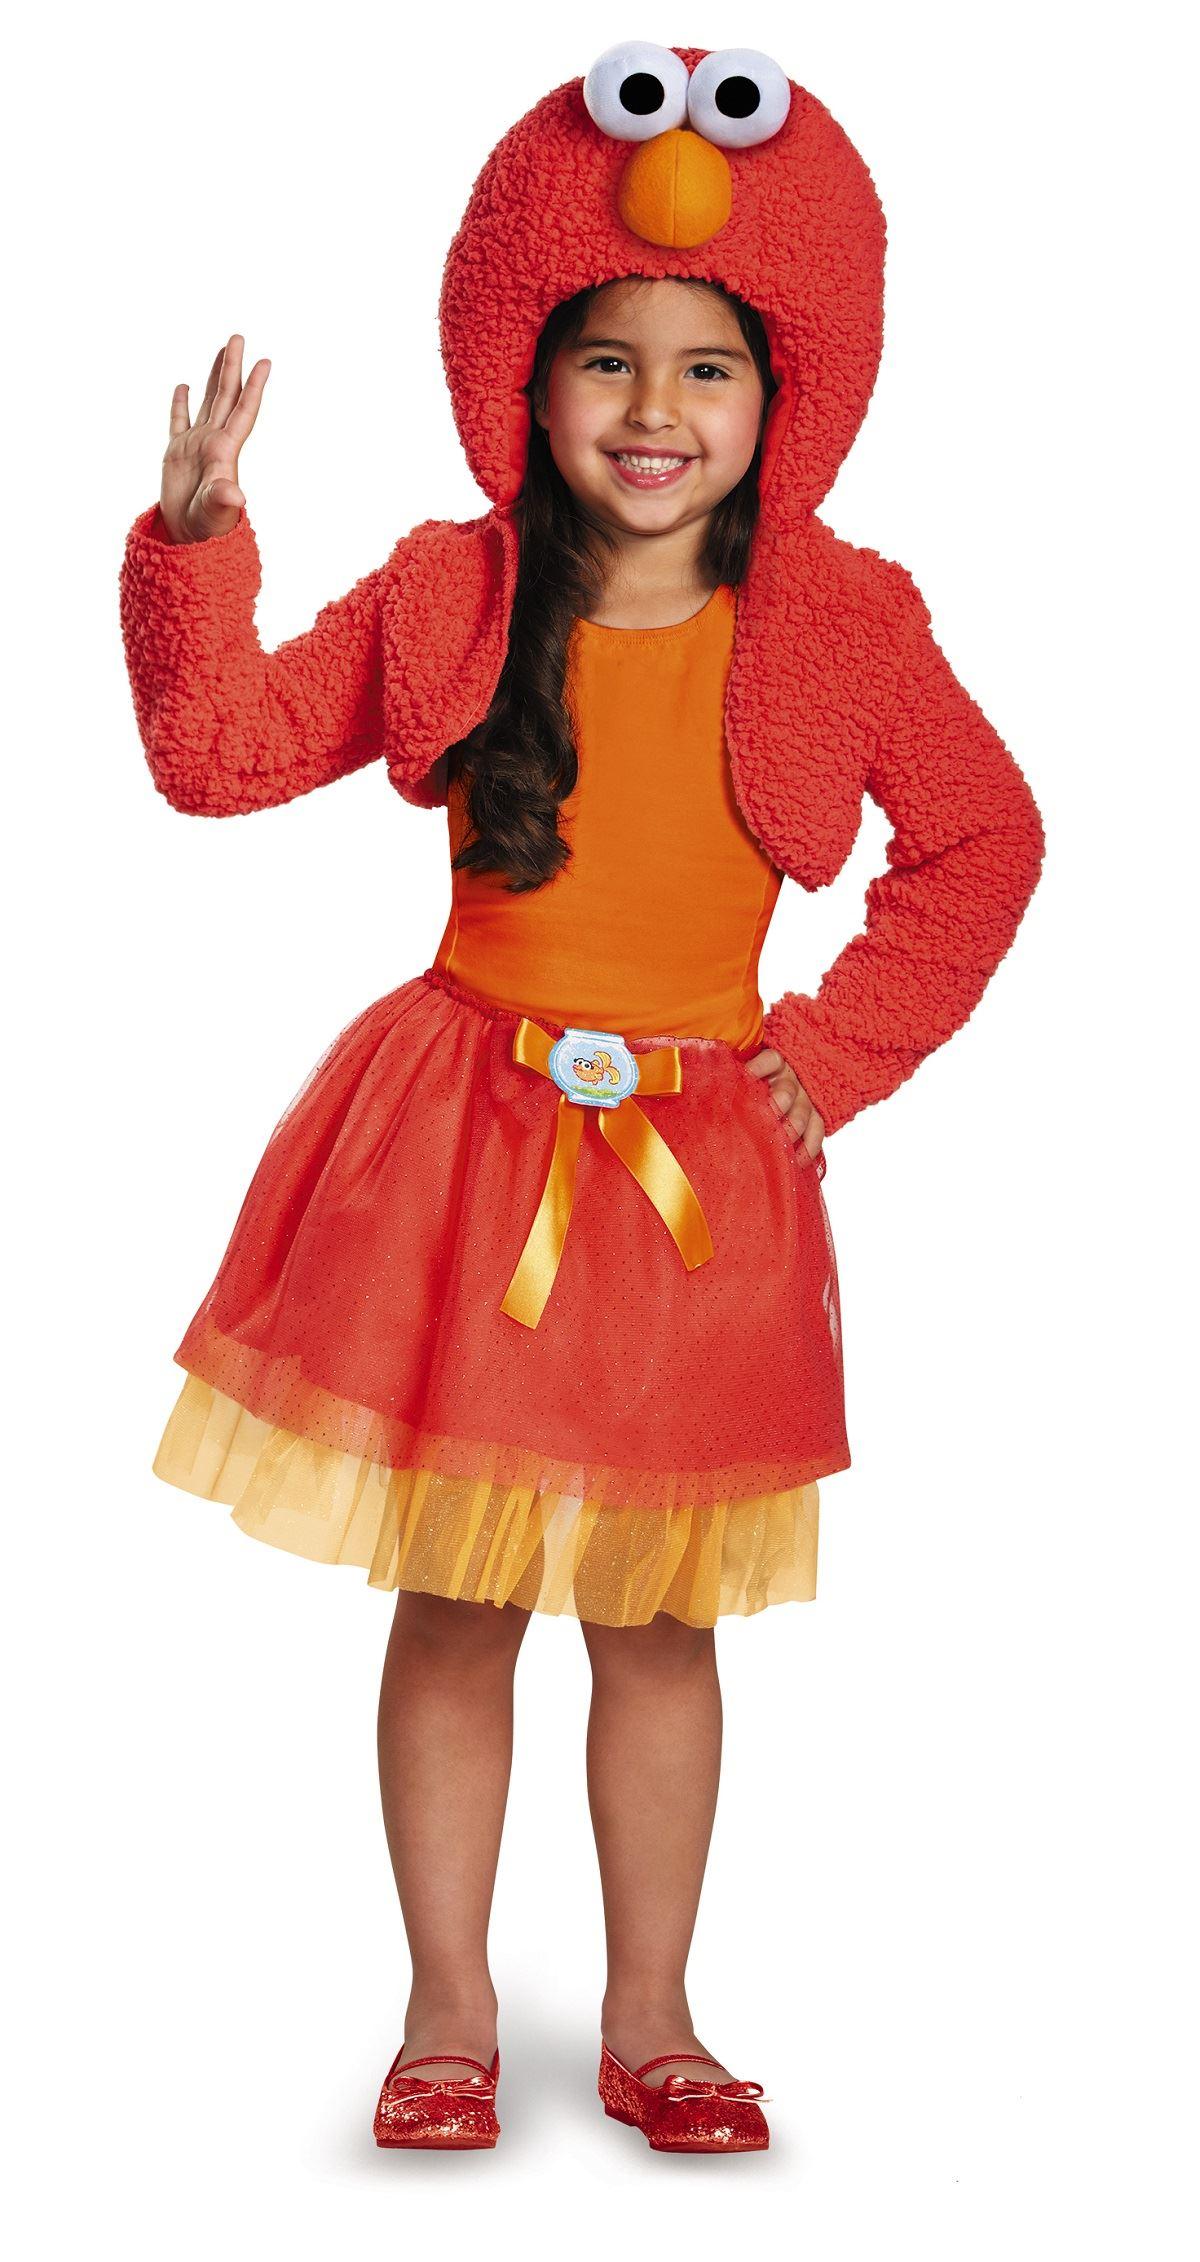 Kids Elmo Shrug And Tutu Costume  sc 1 st  The Costume Land & Kids Elmo Shrug And Tutu Costume   $25.99   The Costume Land